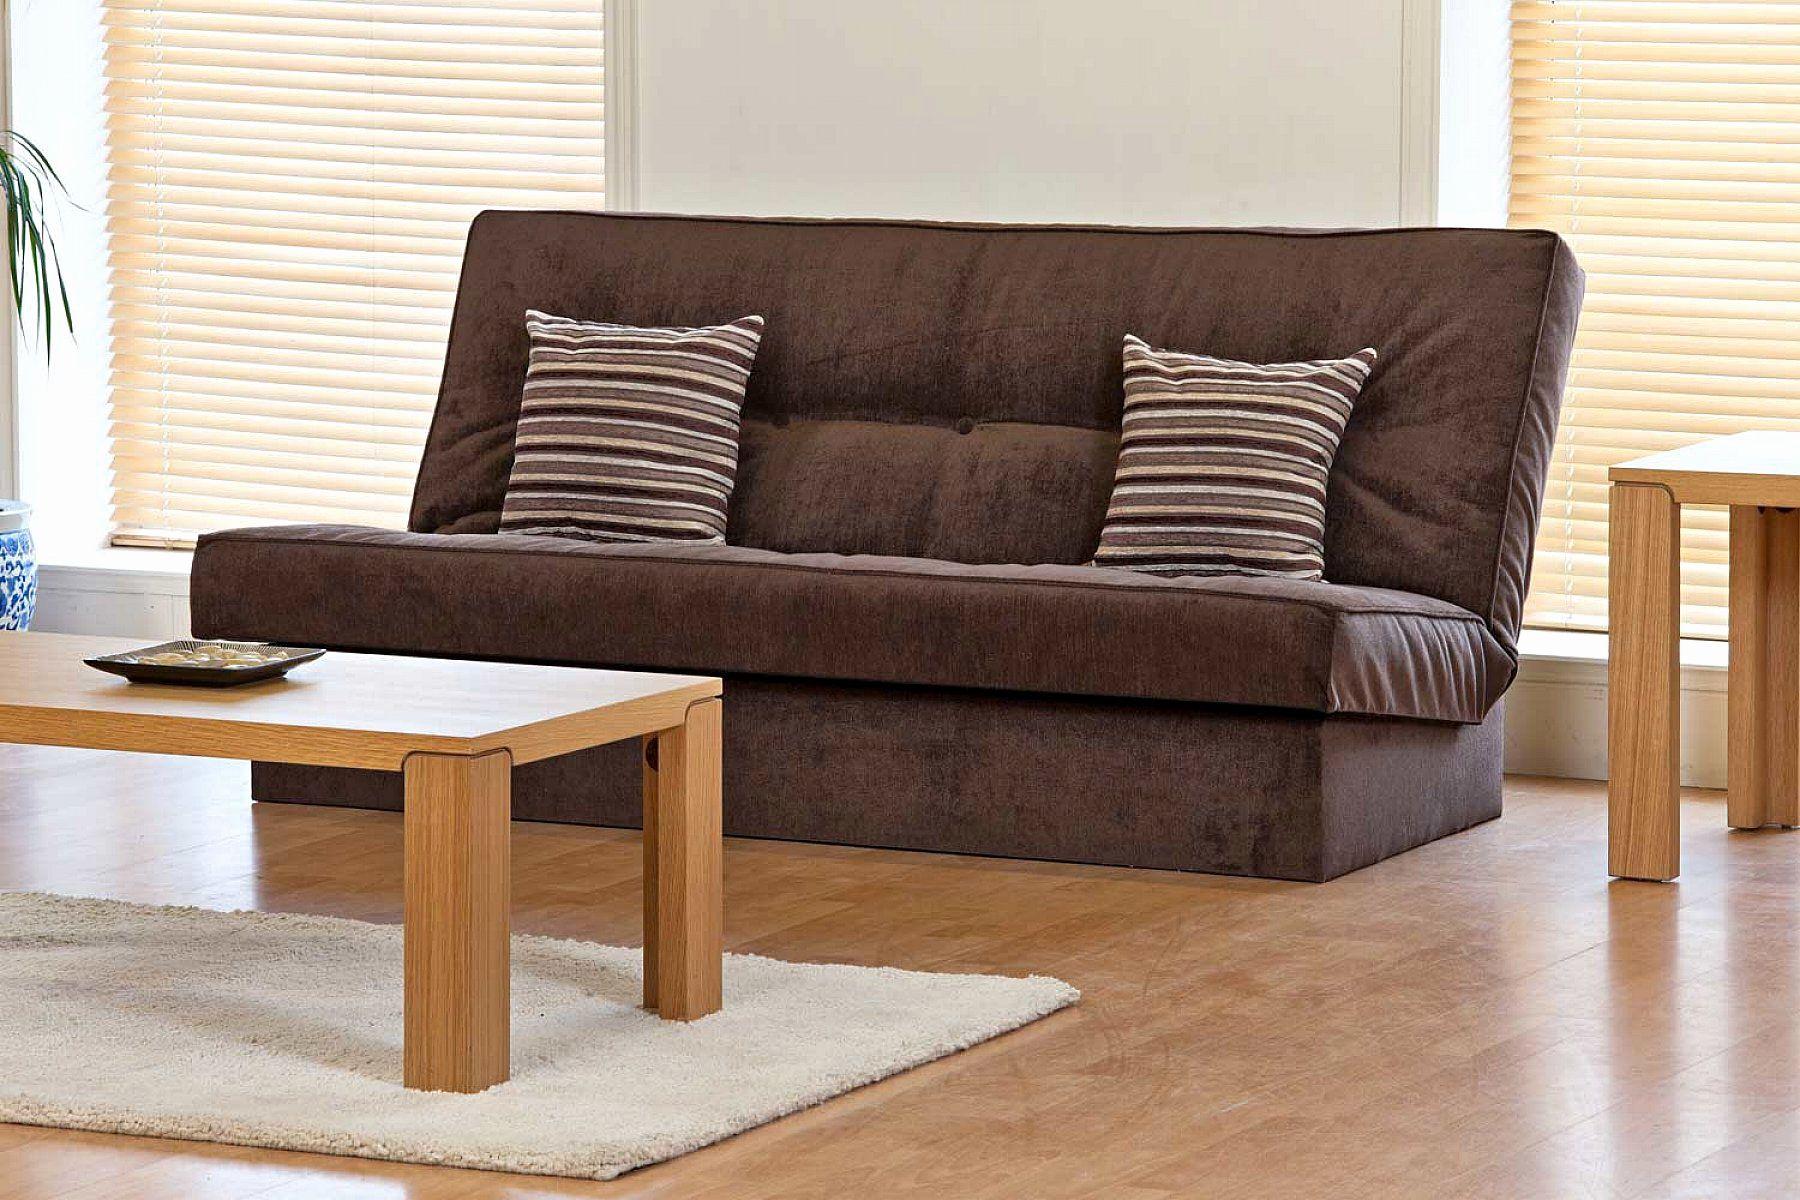 Inspirational Slipcovers for Sectional sofa Photos futon 4